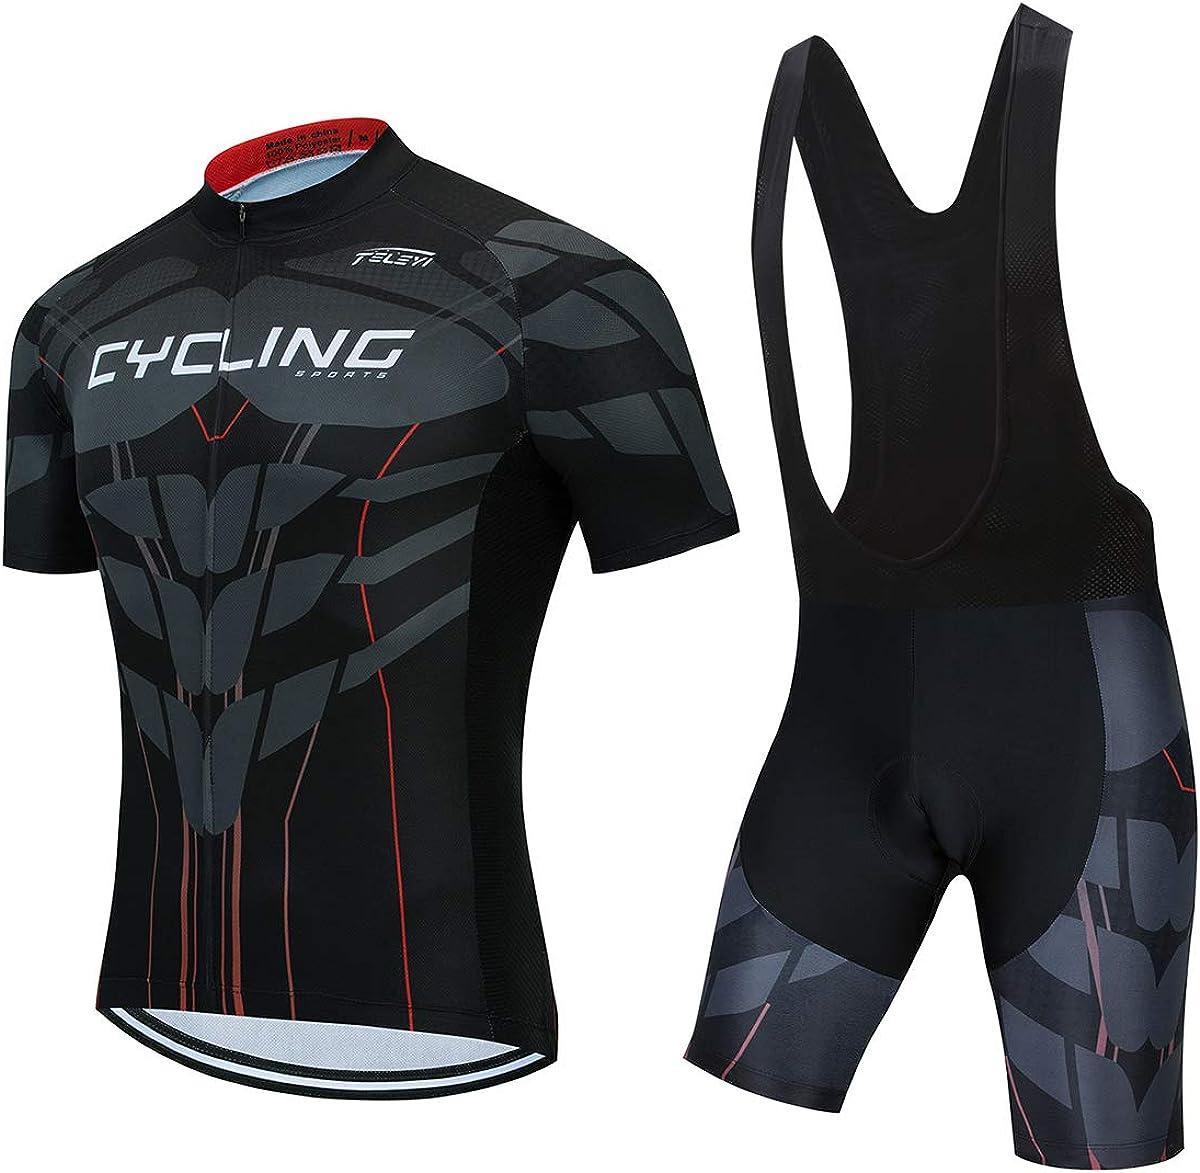 JPOJPO Men's Cycling Short Sleeve Jersey price Shorts Padded Set Luxury goods